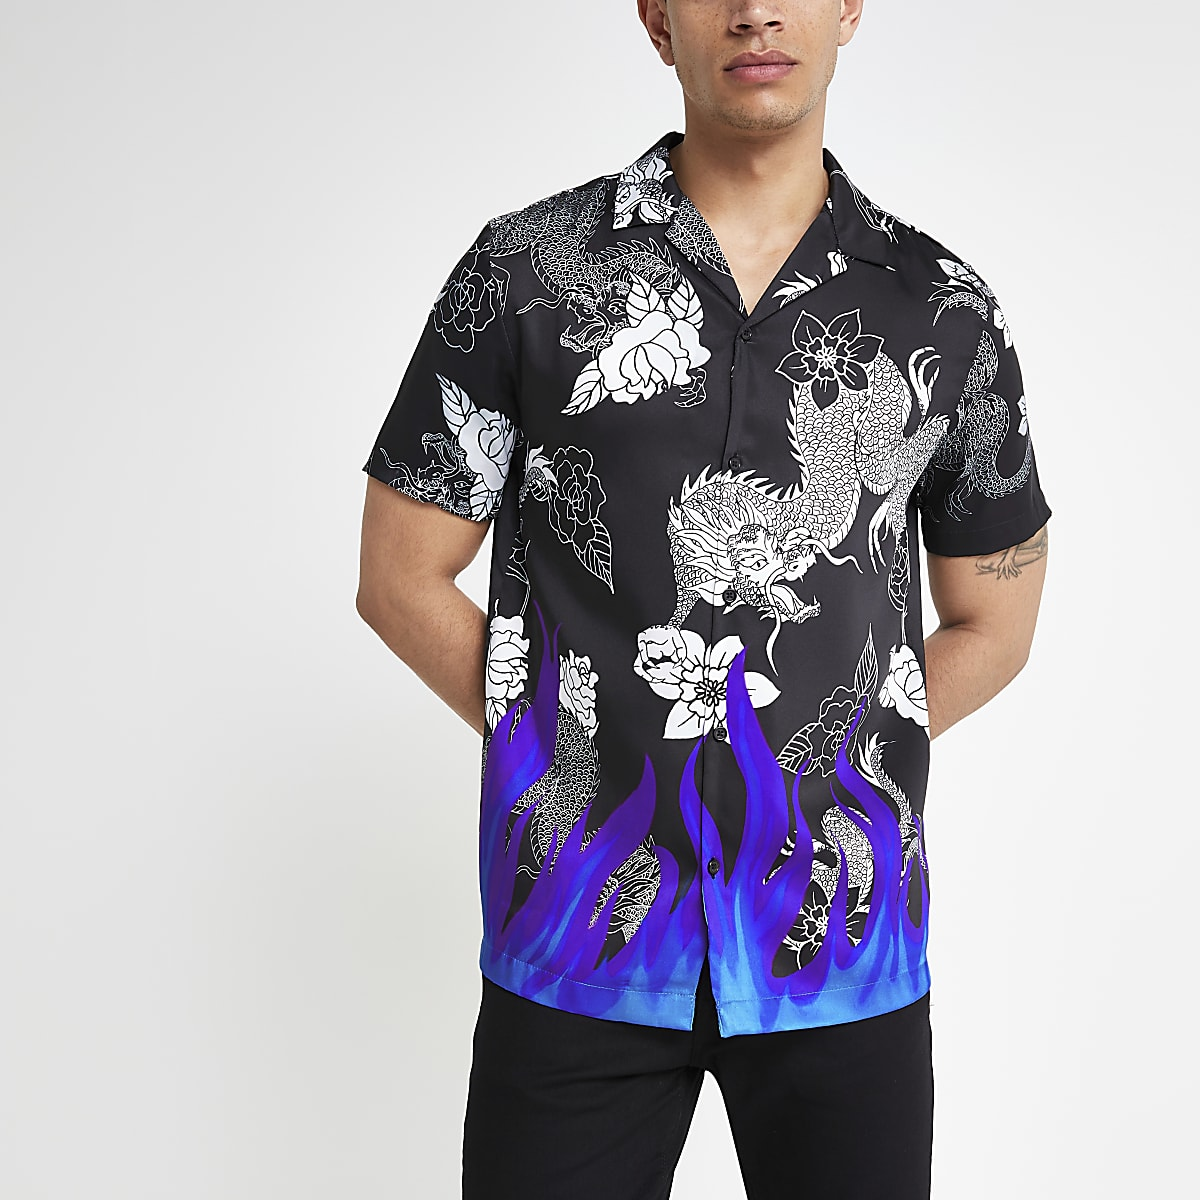 Black neon flame short sleeve shirt